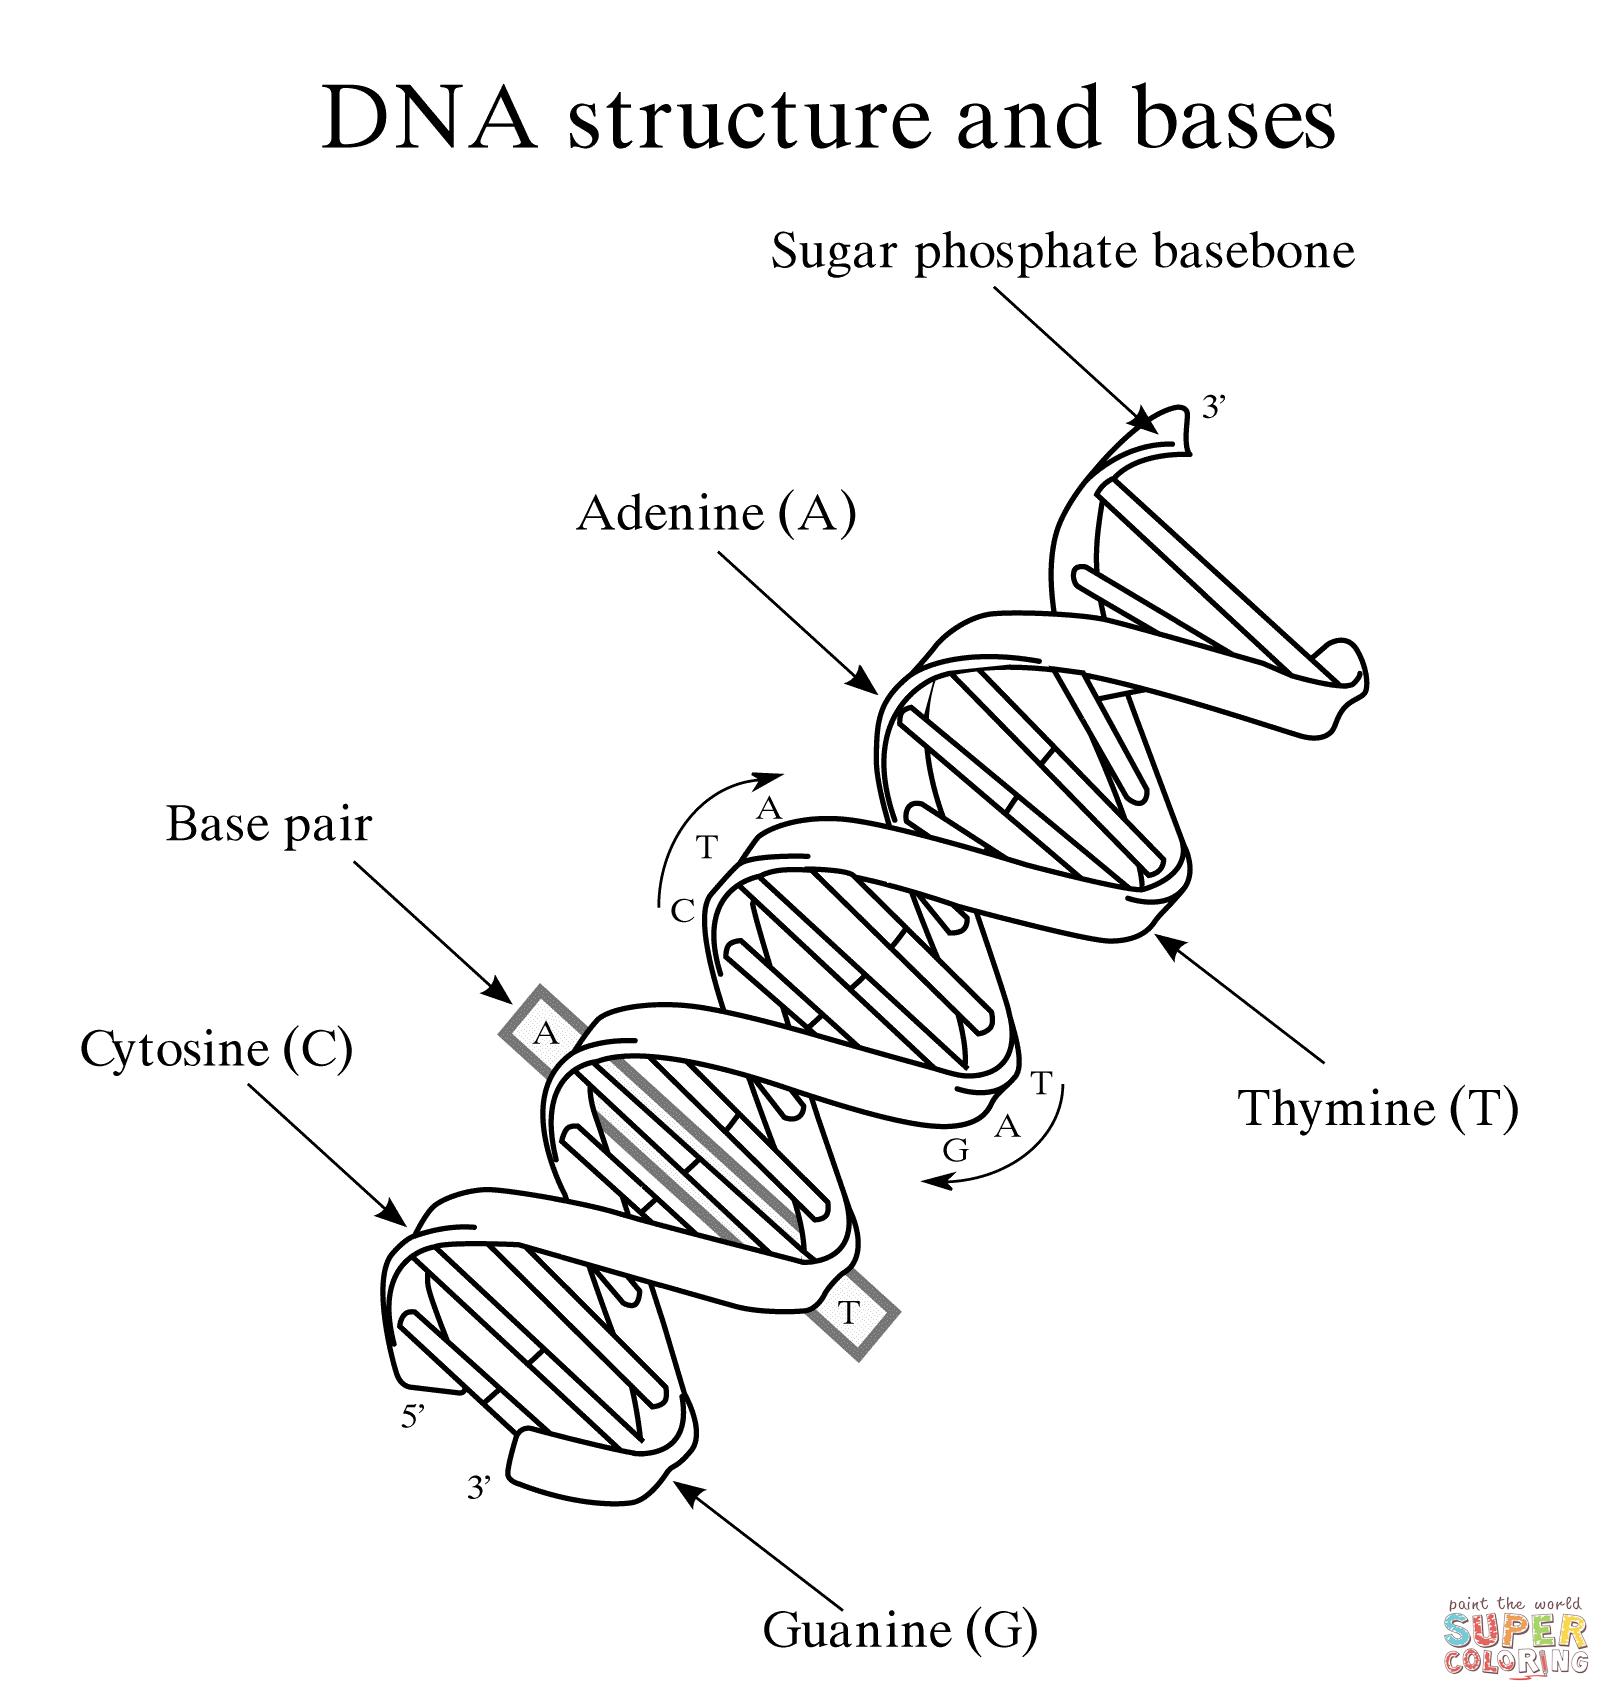 Dna Structure And Bases Super Coloring Molecule Diagram Transcription And Translation Dna Molecule [ 1702 x 1612 Pixel ]